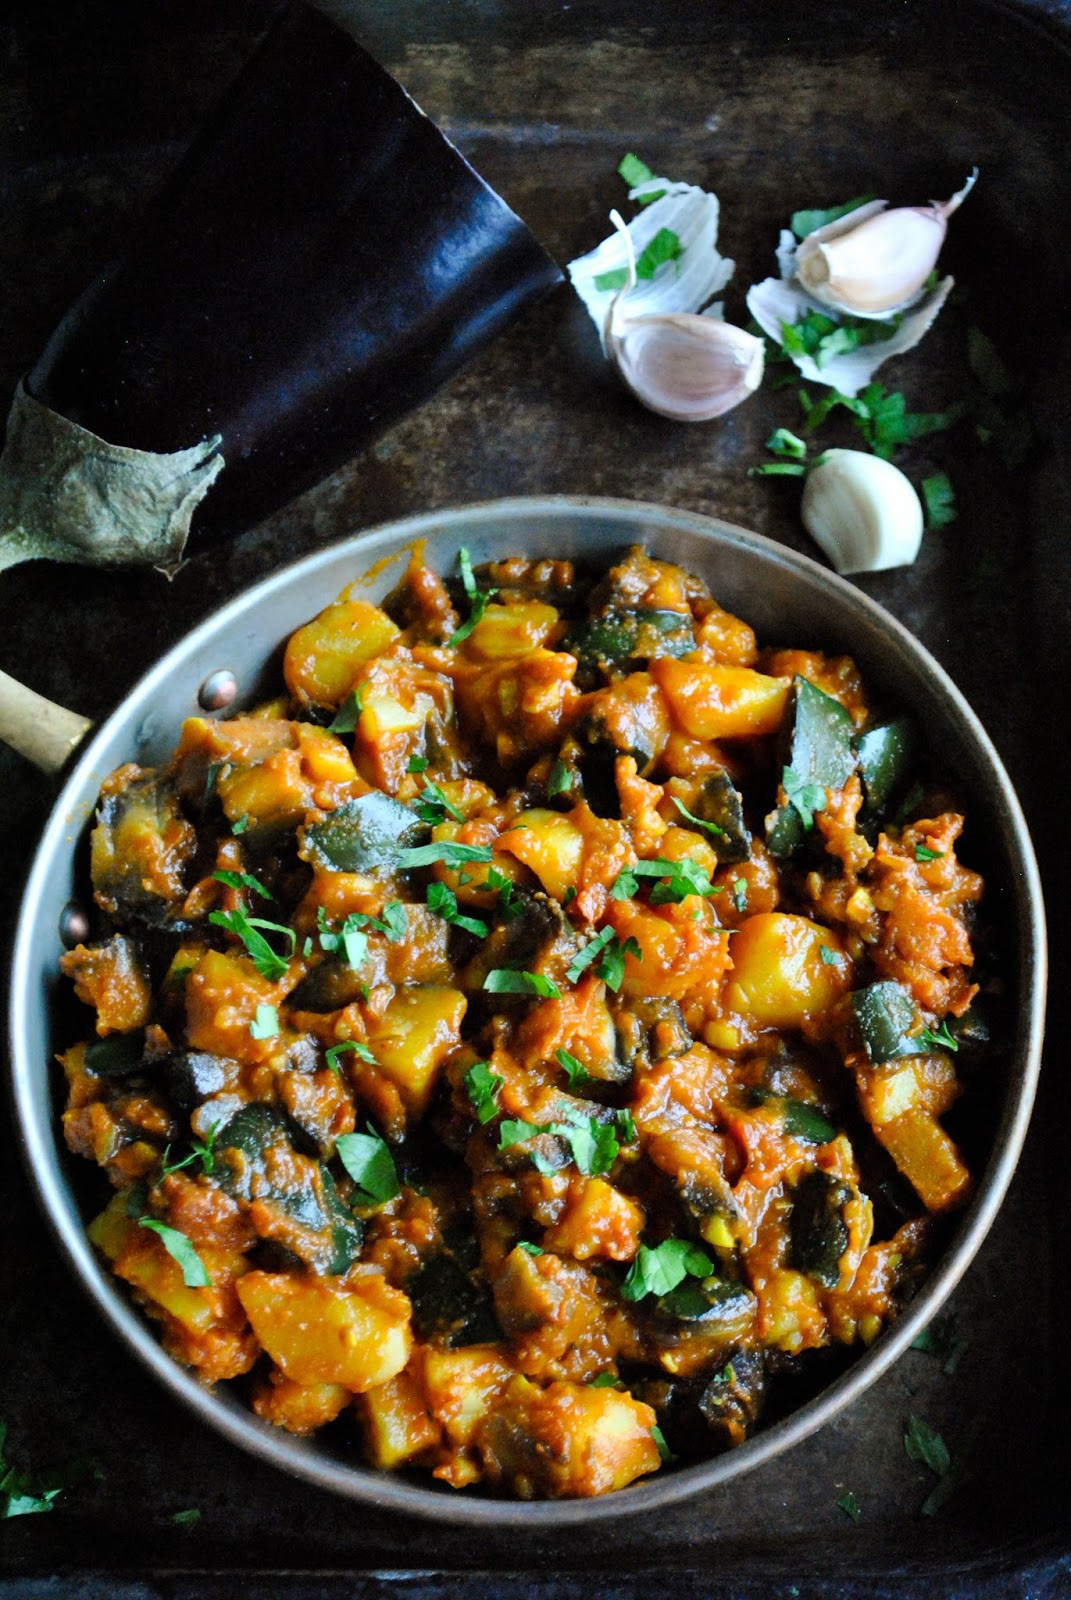 Quick And Easy Vegan Recipes  15 delicious vegan recipes for beginners VeganSandra